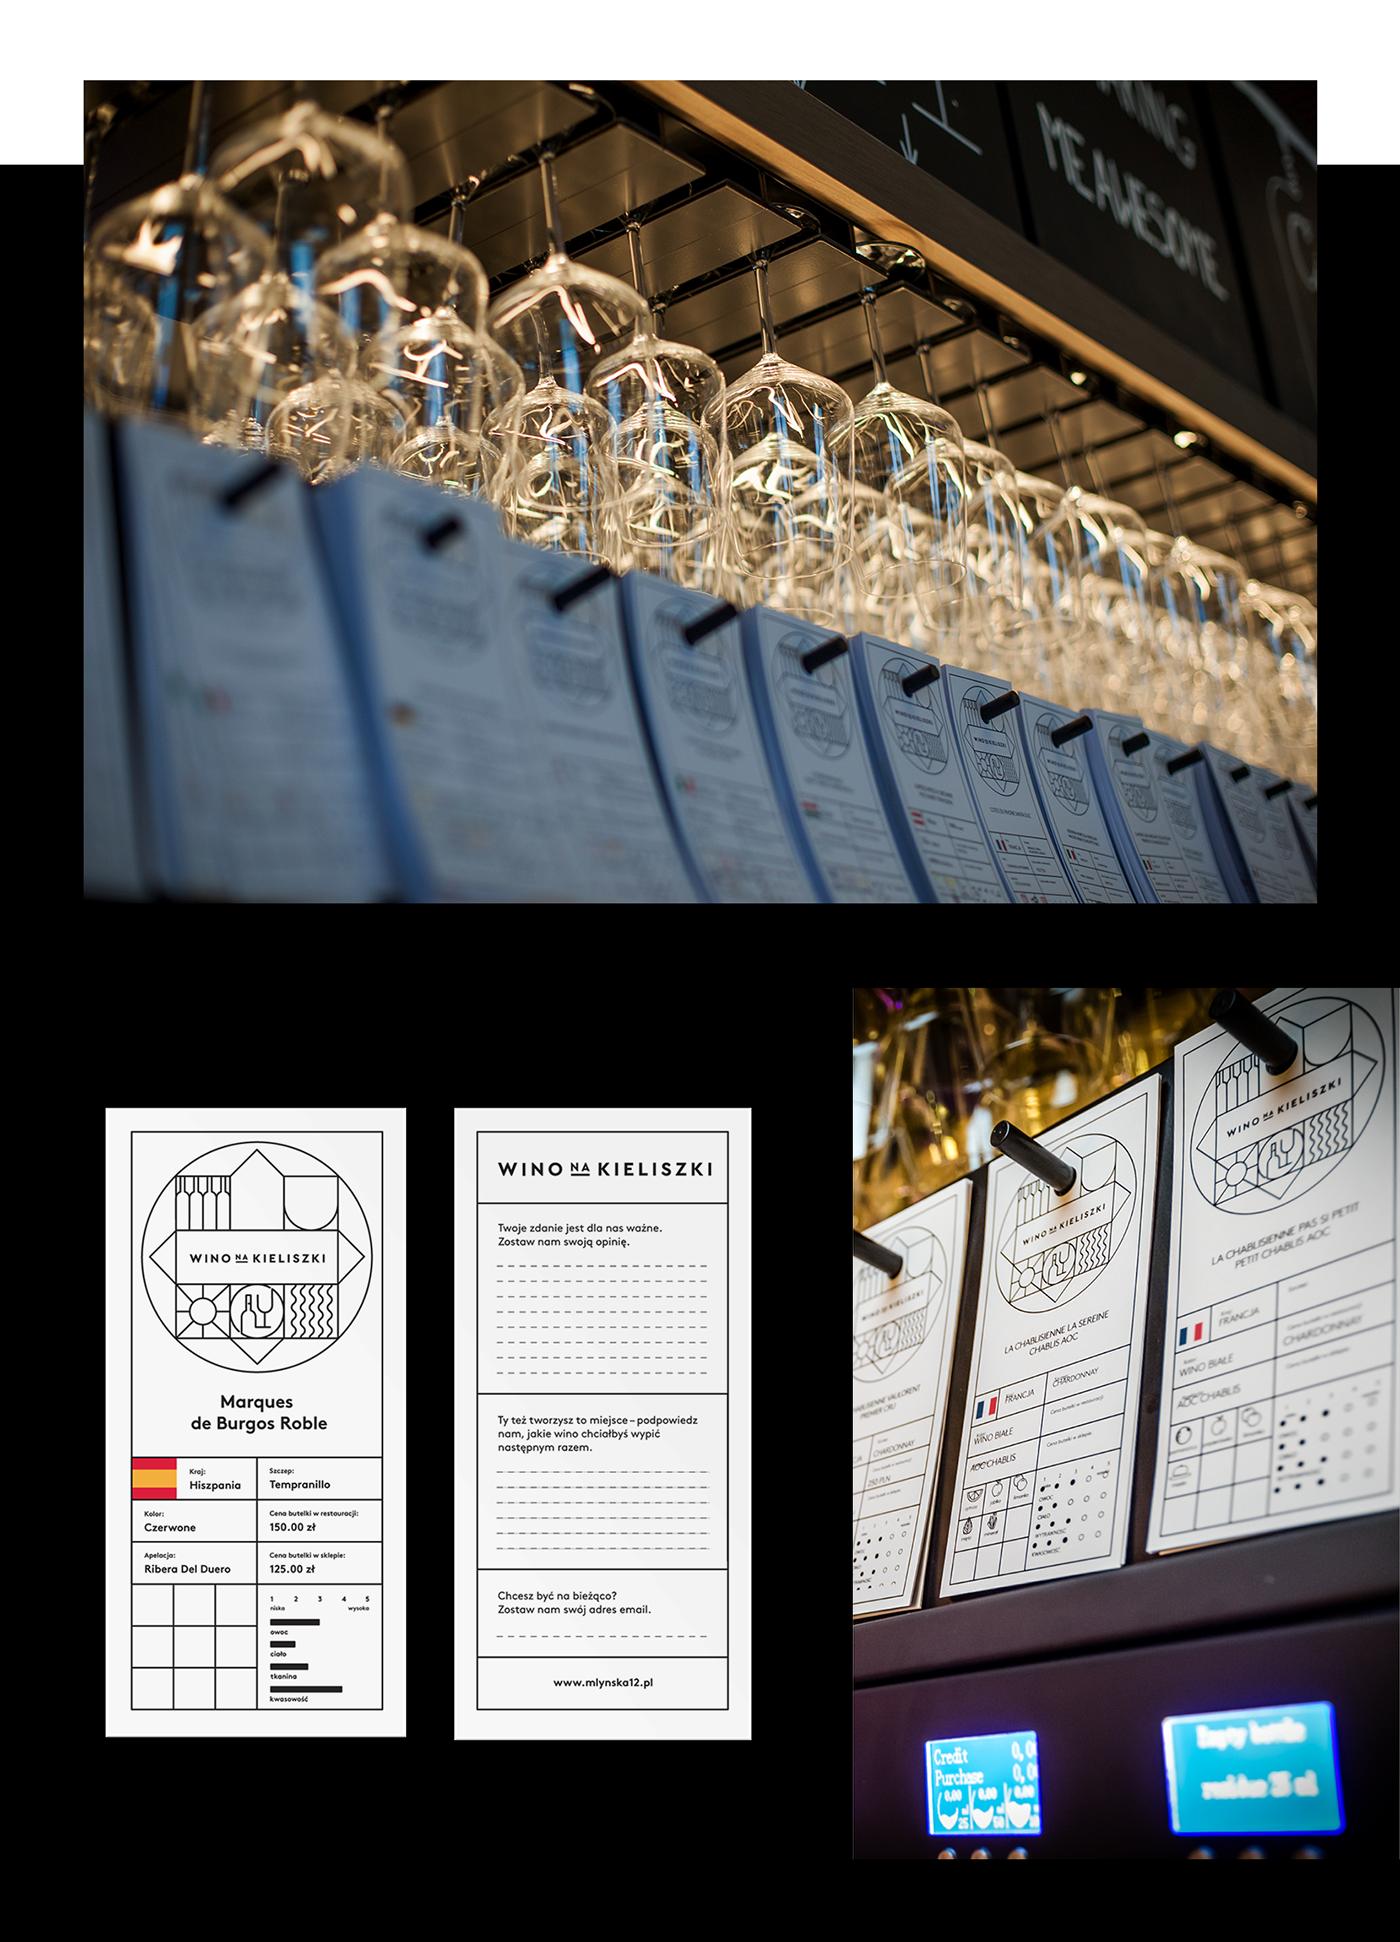 beand design wine tapbar poznan wine tap brand identity system